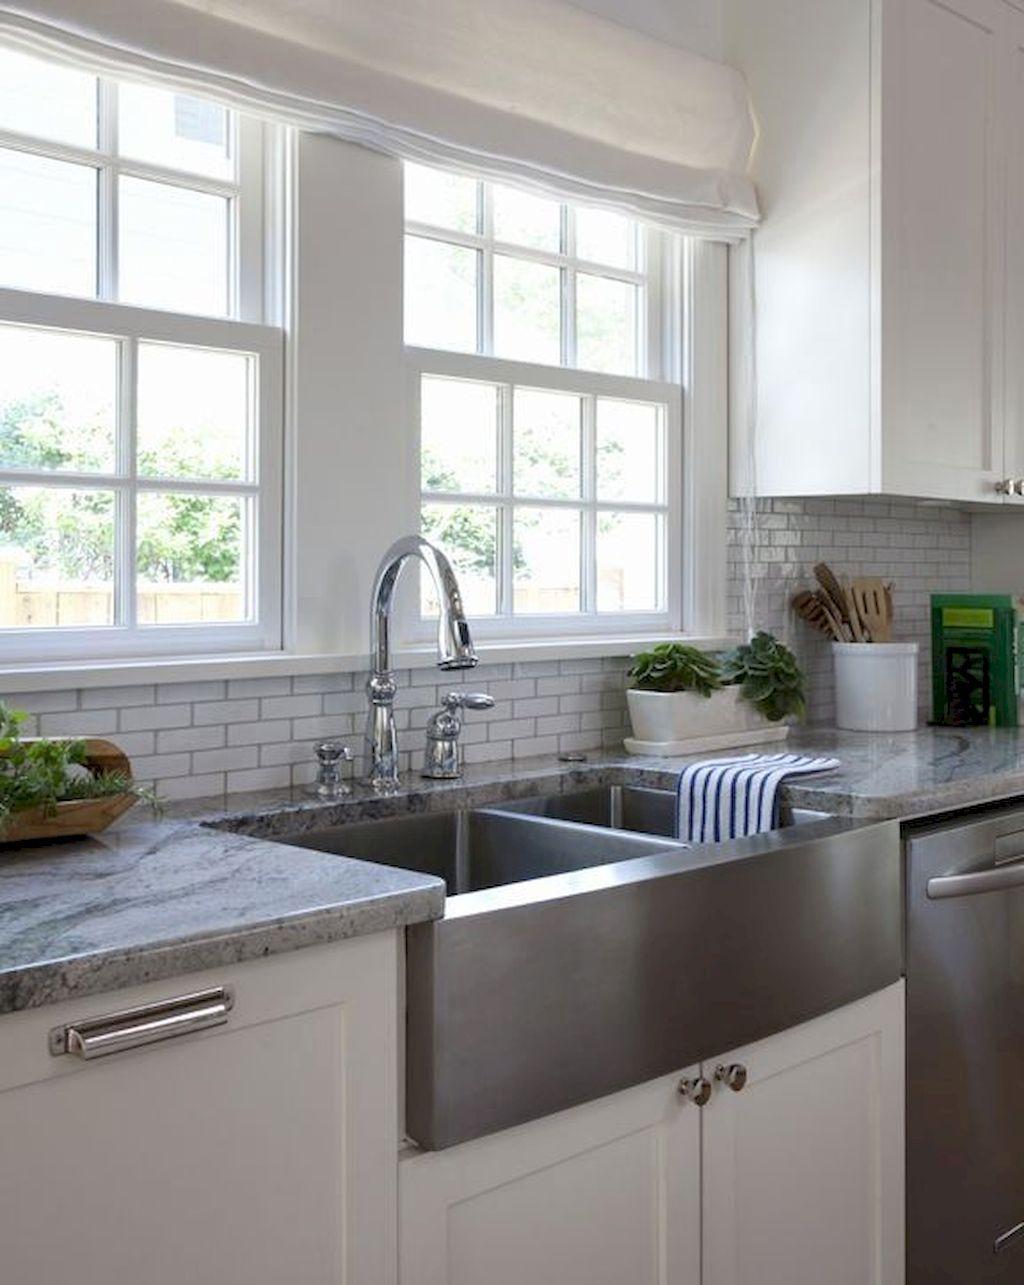 Pin On Kitchen Designs Decor